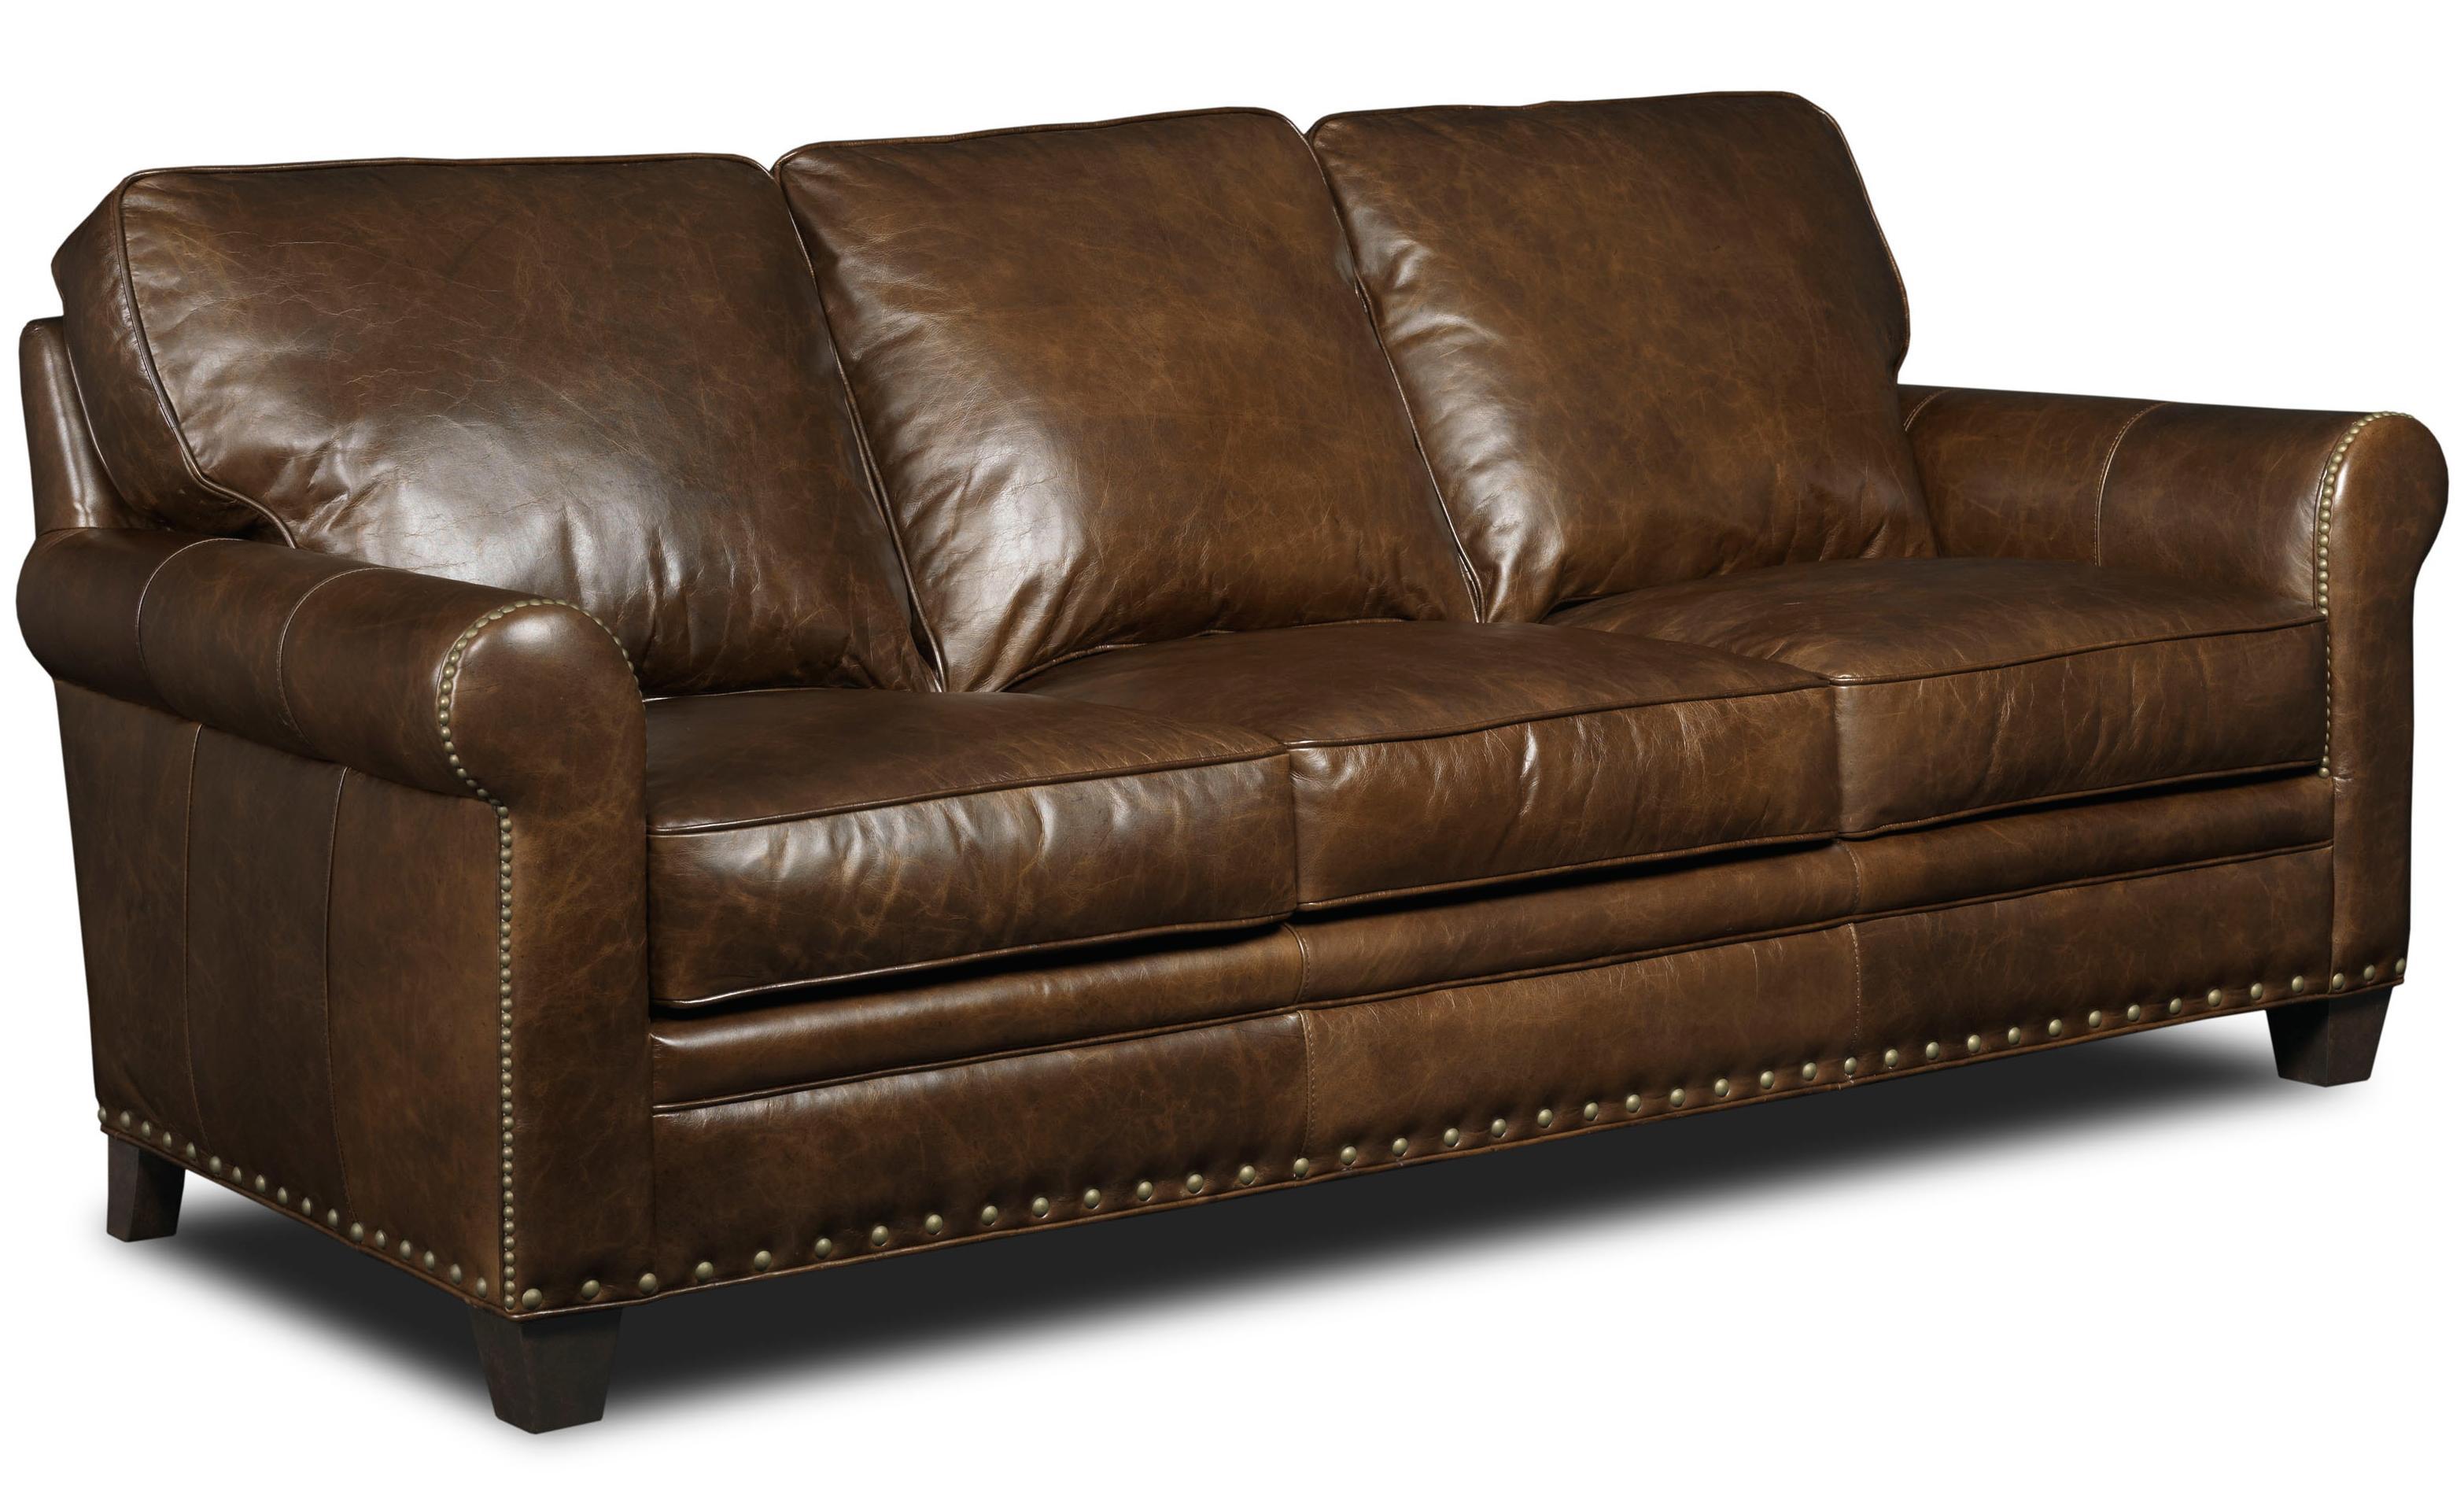 Hooker Furniture Hemingway Eden Transitional Stationary Sofa - Item Number: SS167-03-088